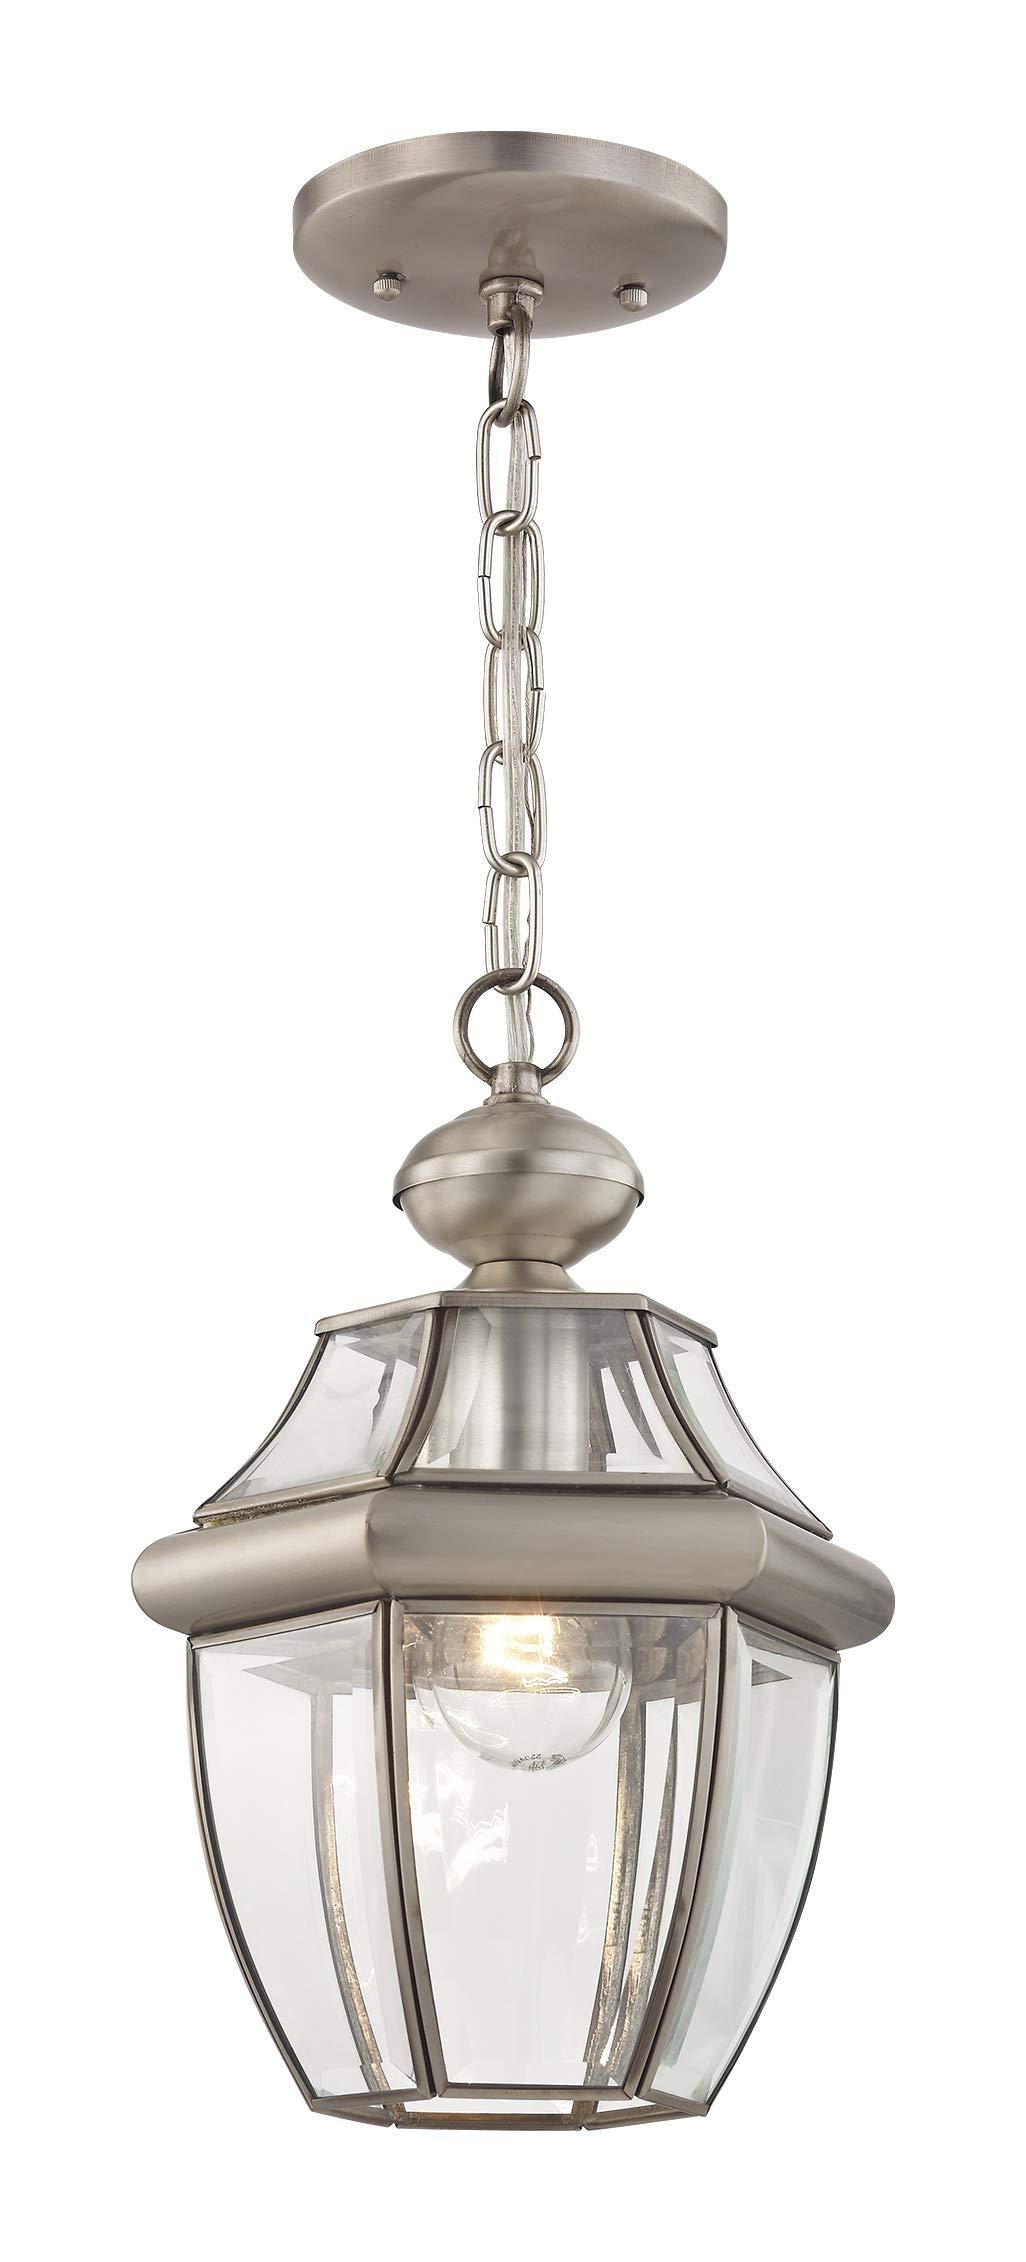 Livex Lighting 2152-91 Monterey 1-Light Outdoor Hanging Lantern, Brushed Nickel by Livex Lighting